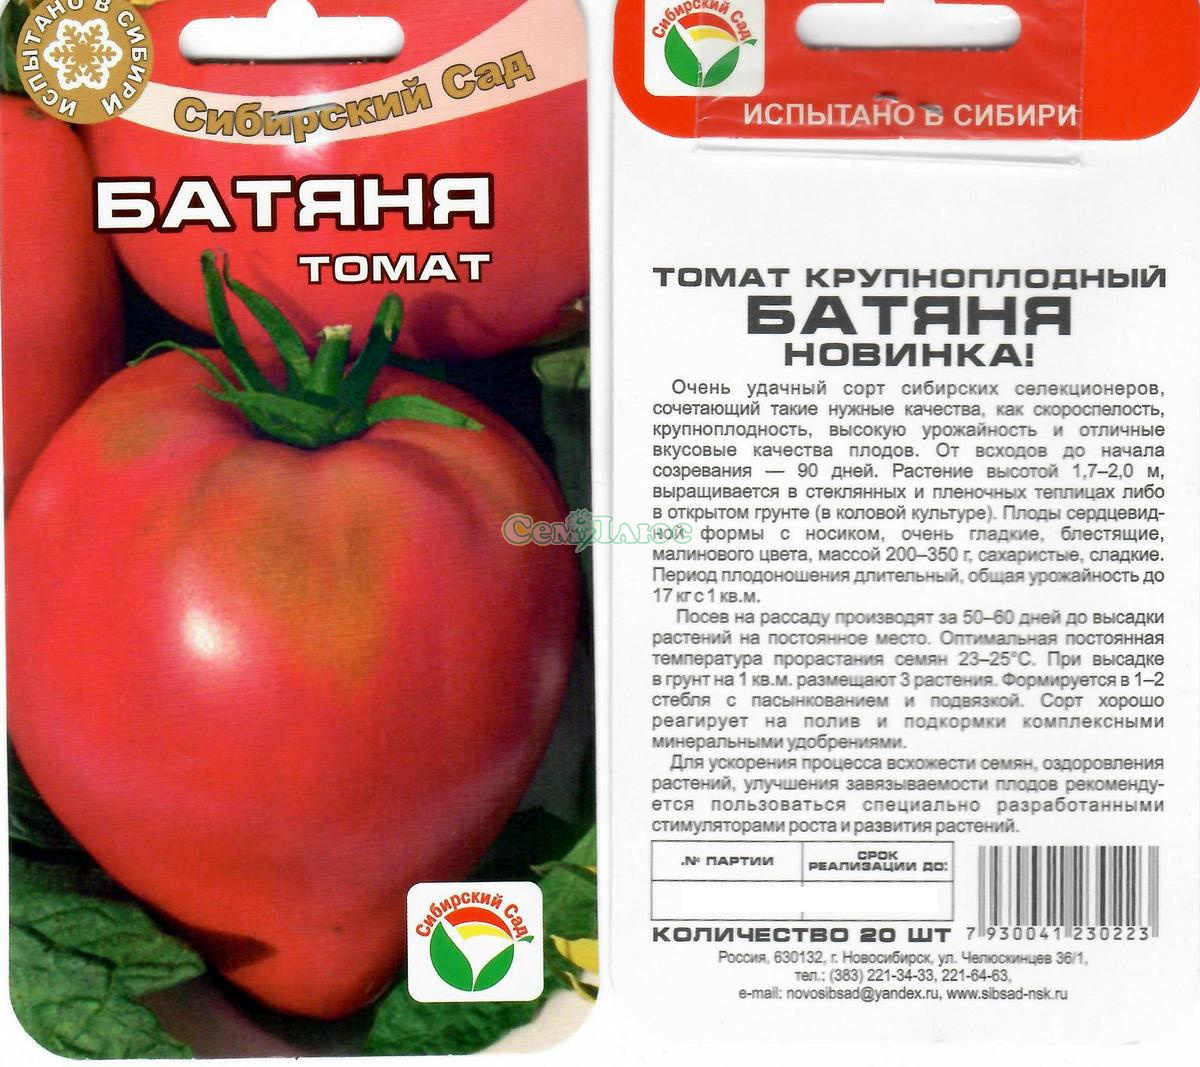 Томат батяня - характеристика и описание сорта, фото русский фермер